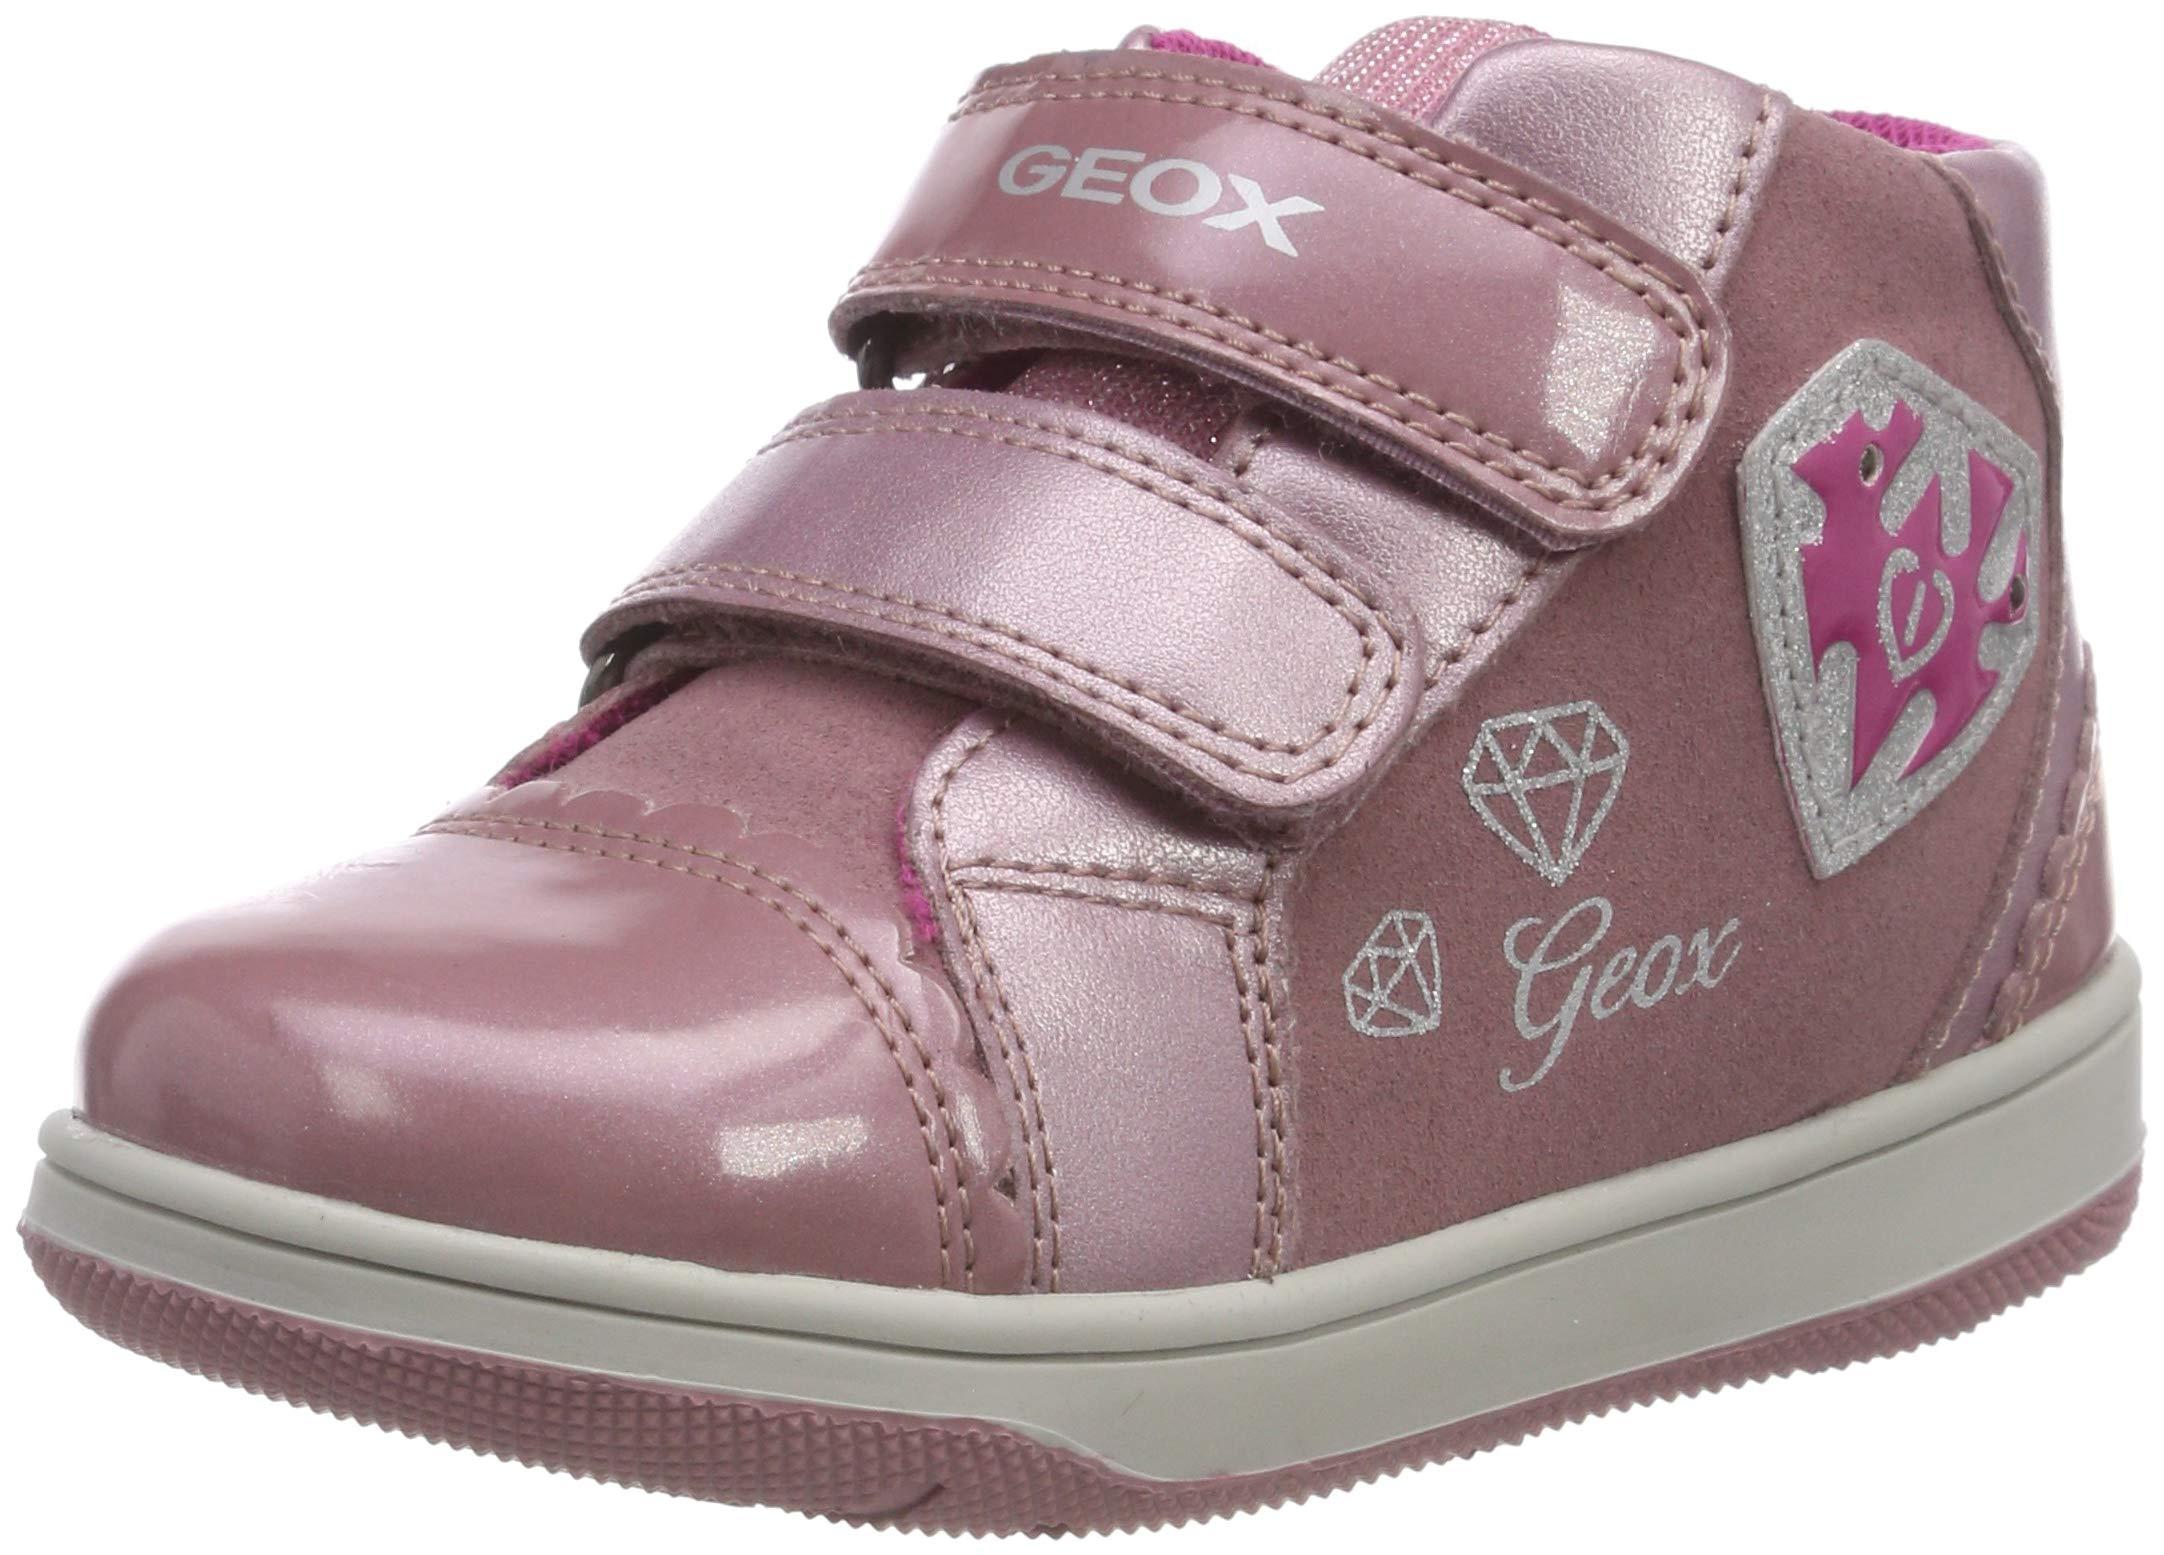 Geox B New Flick Girl C, Zapatillas para Bebés